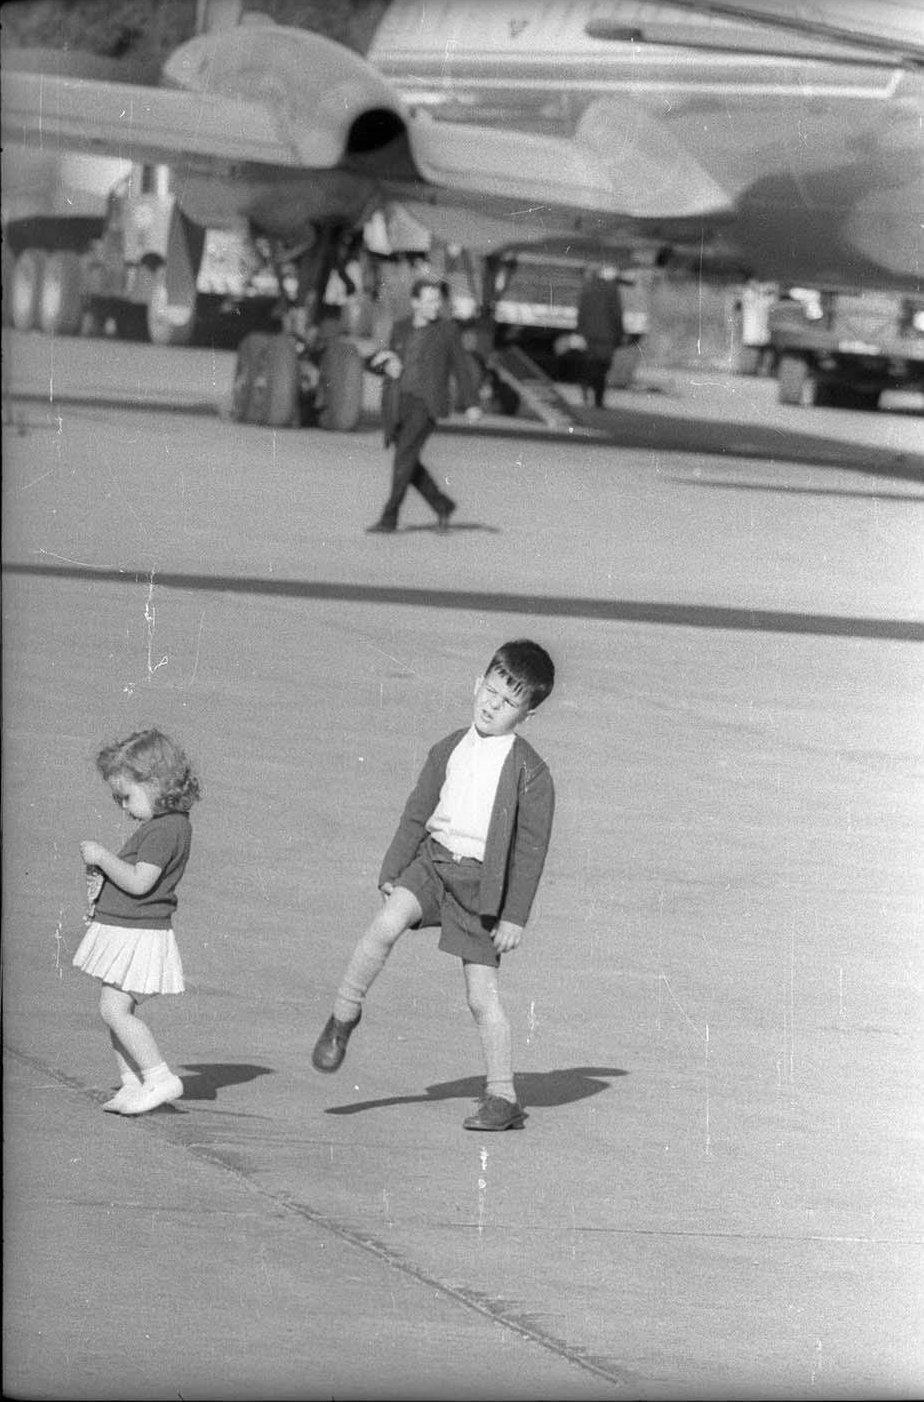 1970-е. Дети на аэродроме